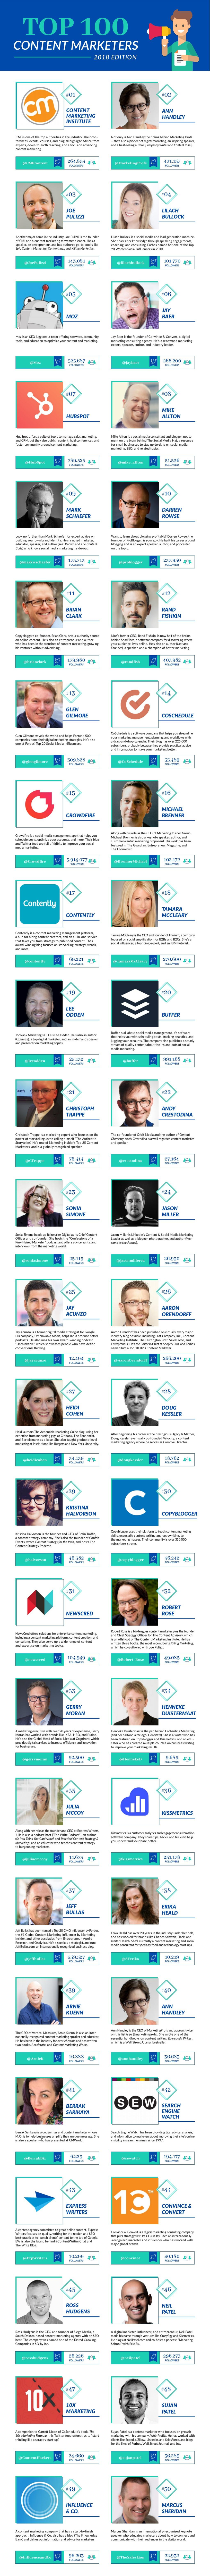 top-100-content-marketers-2018-express-writers-buzzsumo-1-1024.jpg